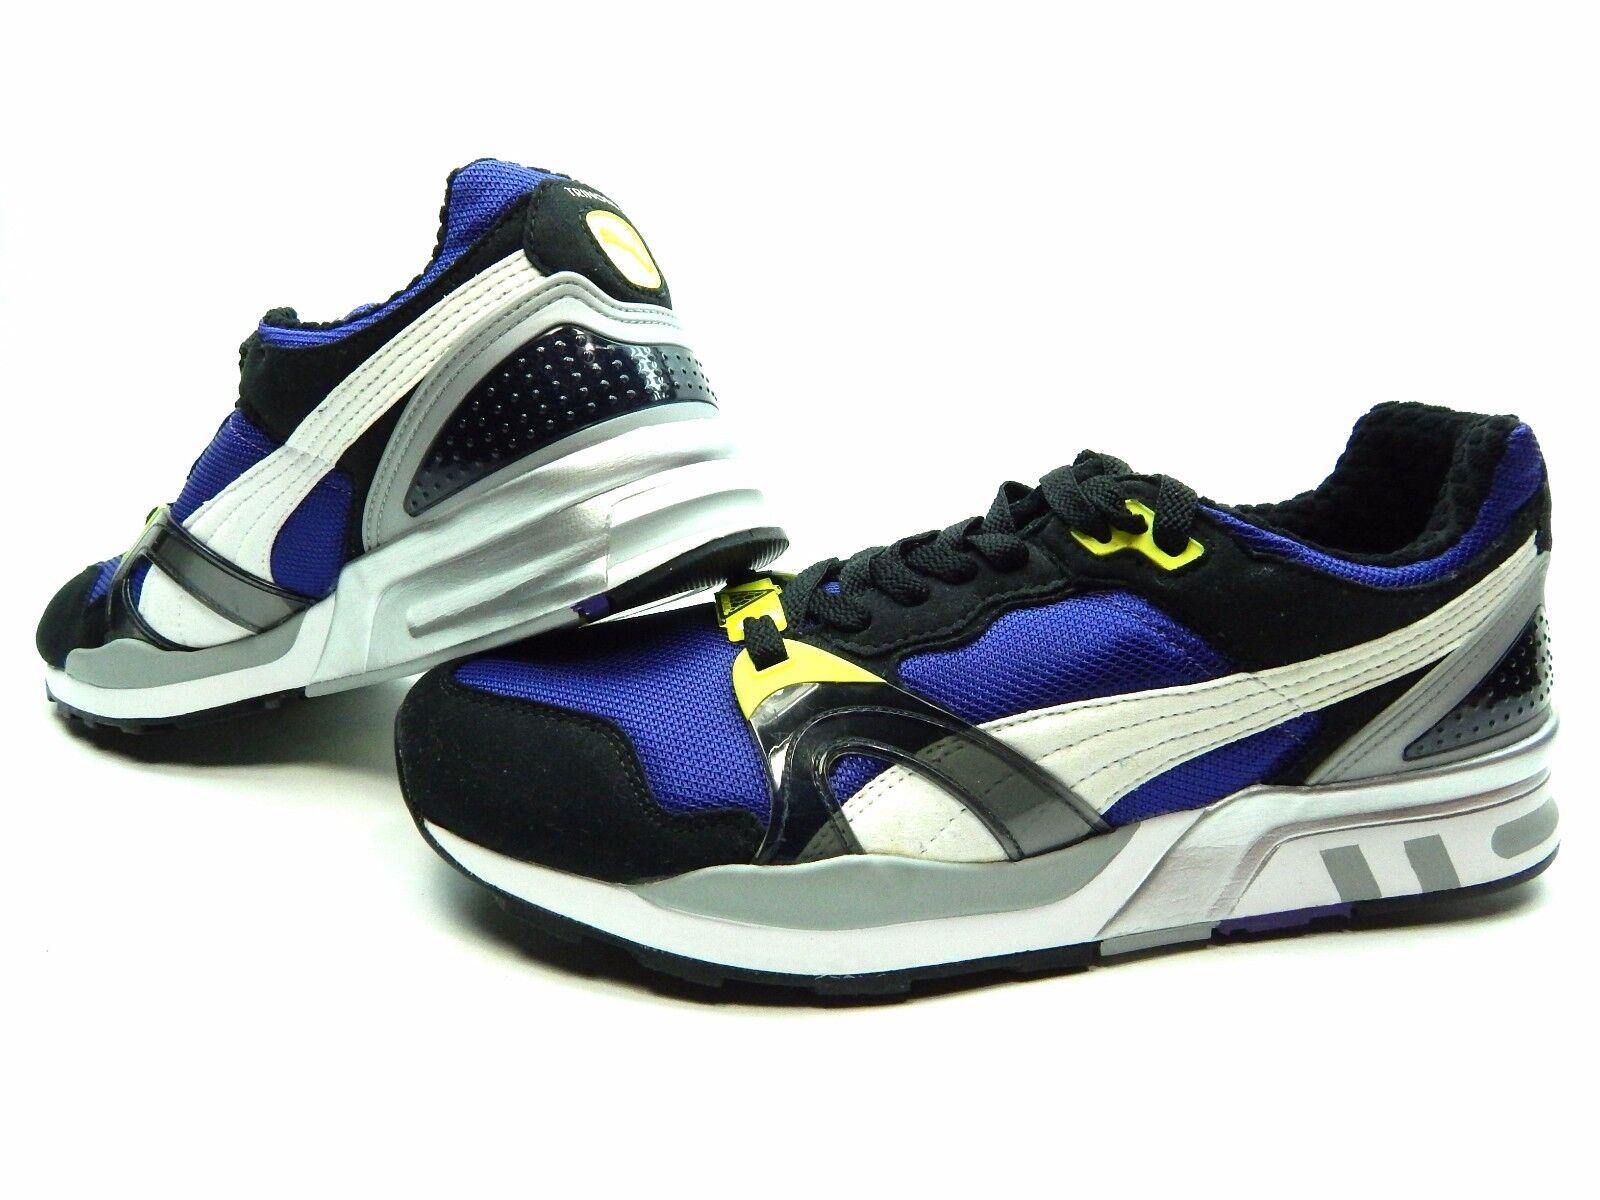 Puma Hombre trinomic XT PRISM Violet 10,5 Negro Blanco zapatos tamaño 10,5 Violet 27f0ad